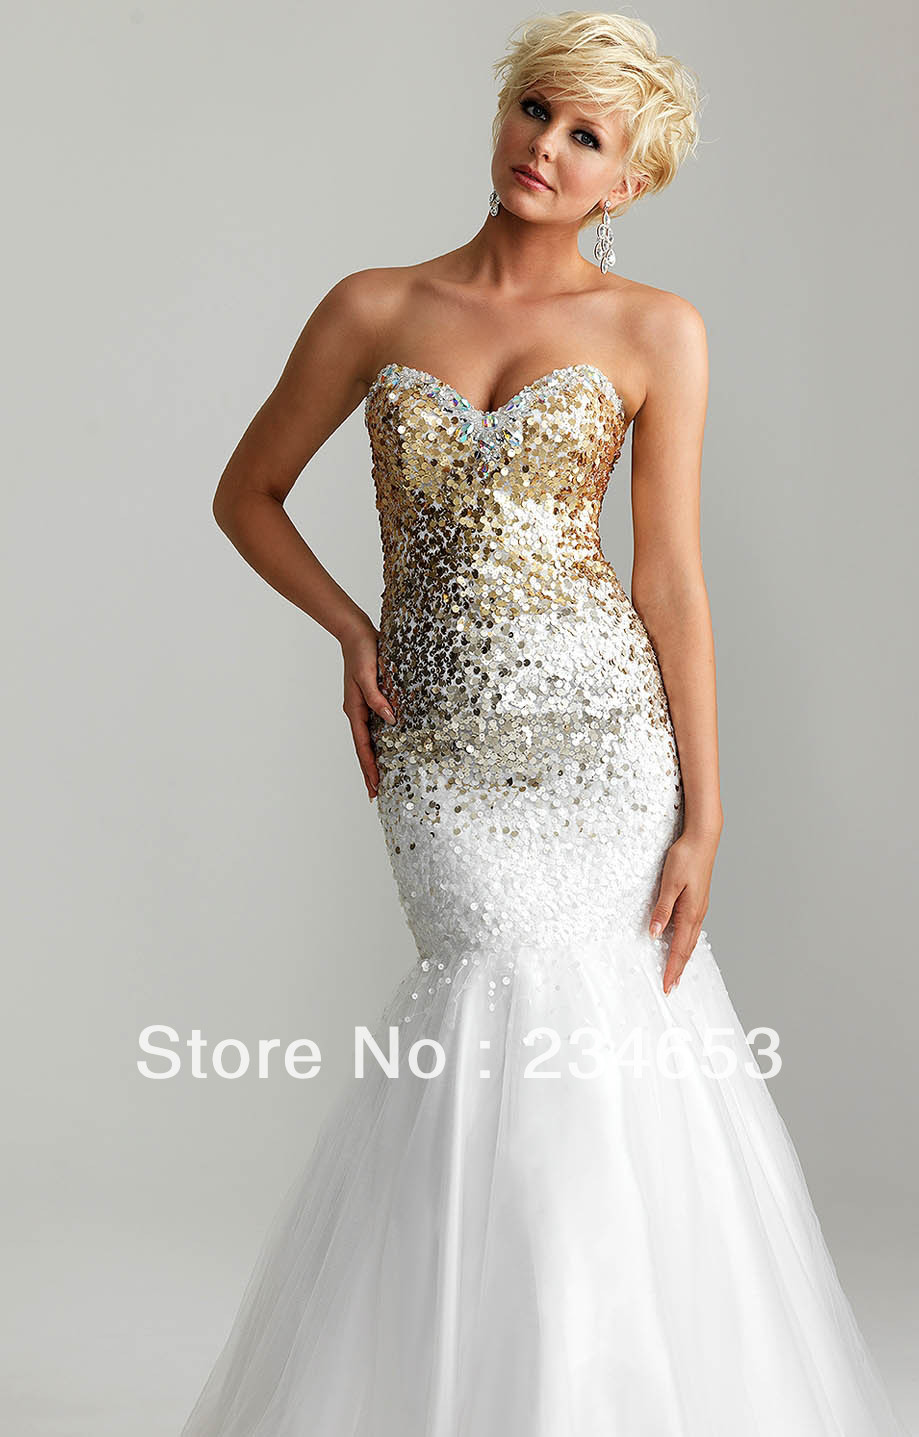 275f4d89c8 Gold And White Prom Dresses Mermaid - Data Dynamic AG